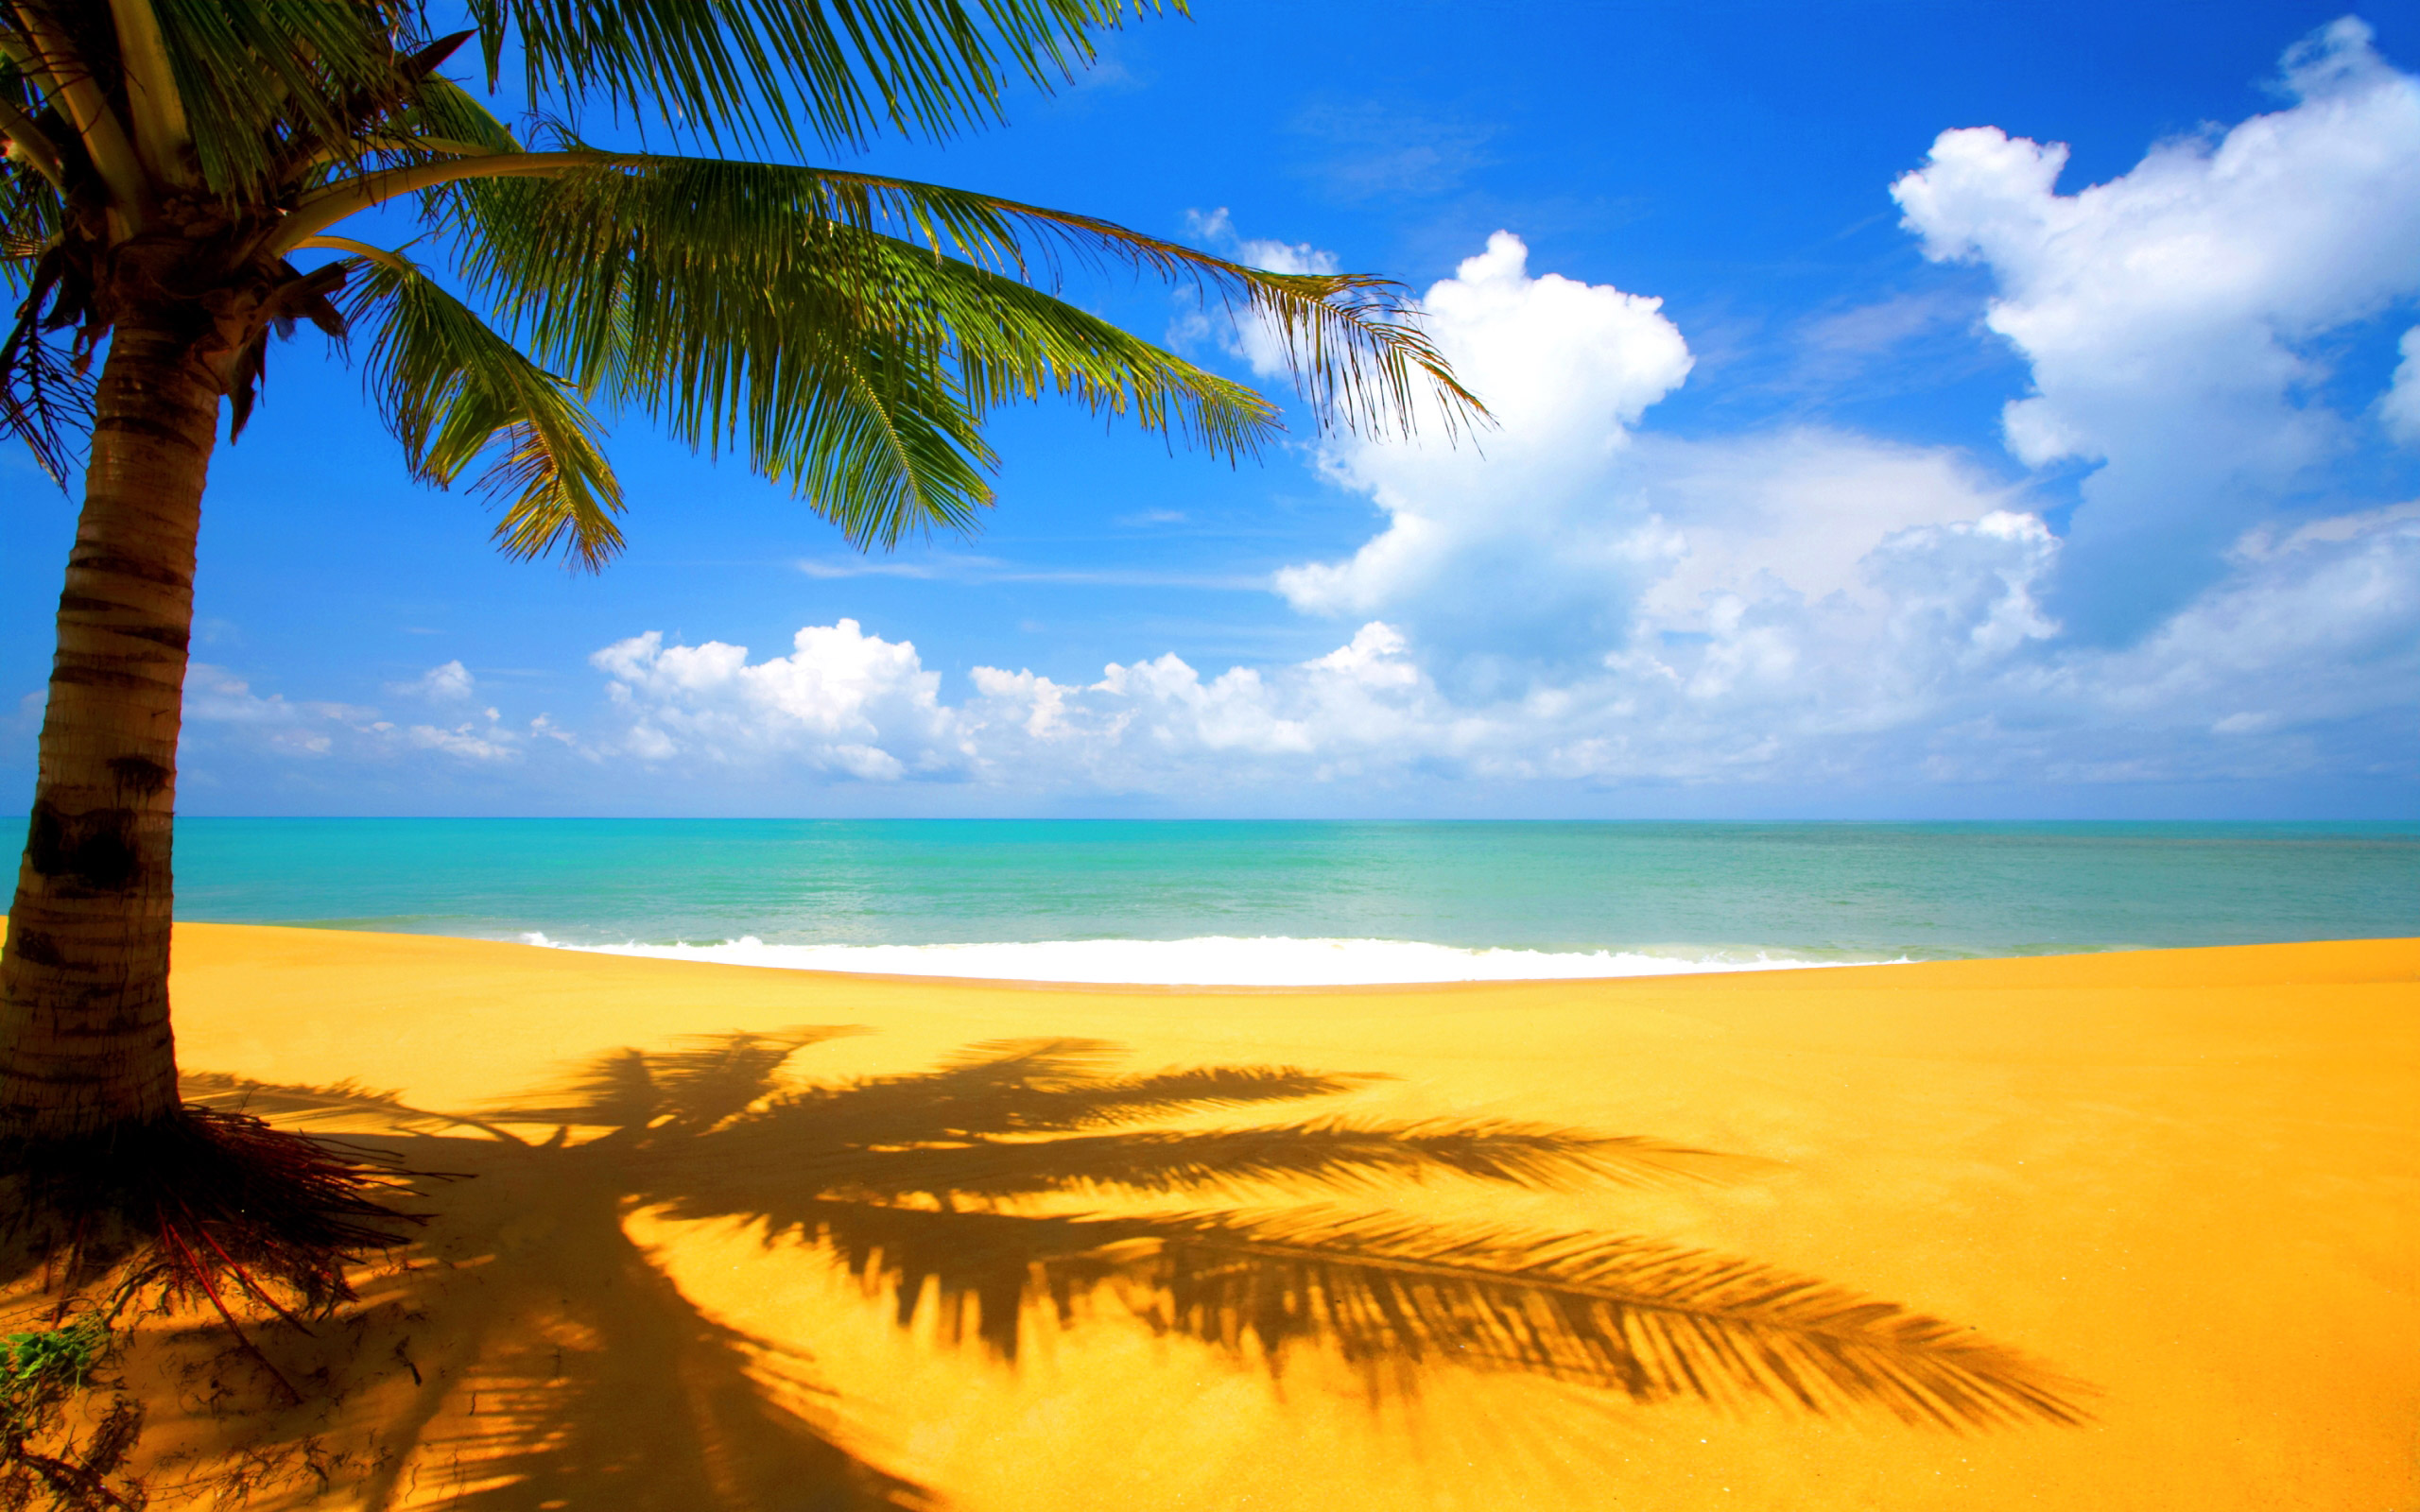 Free Download At The Beach Hd Wallpaper 2560x1600jpeg 2560x1600